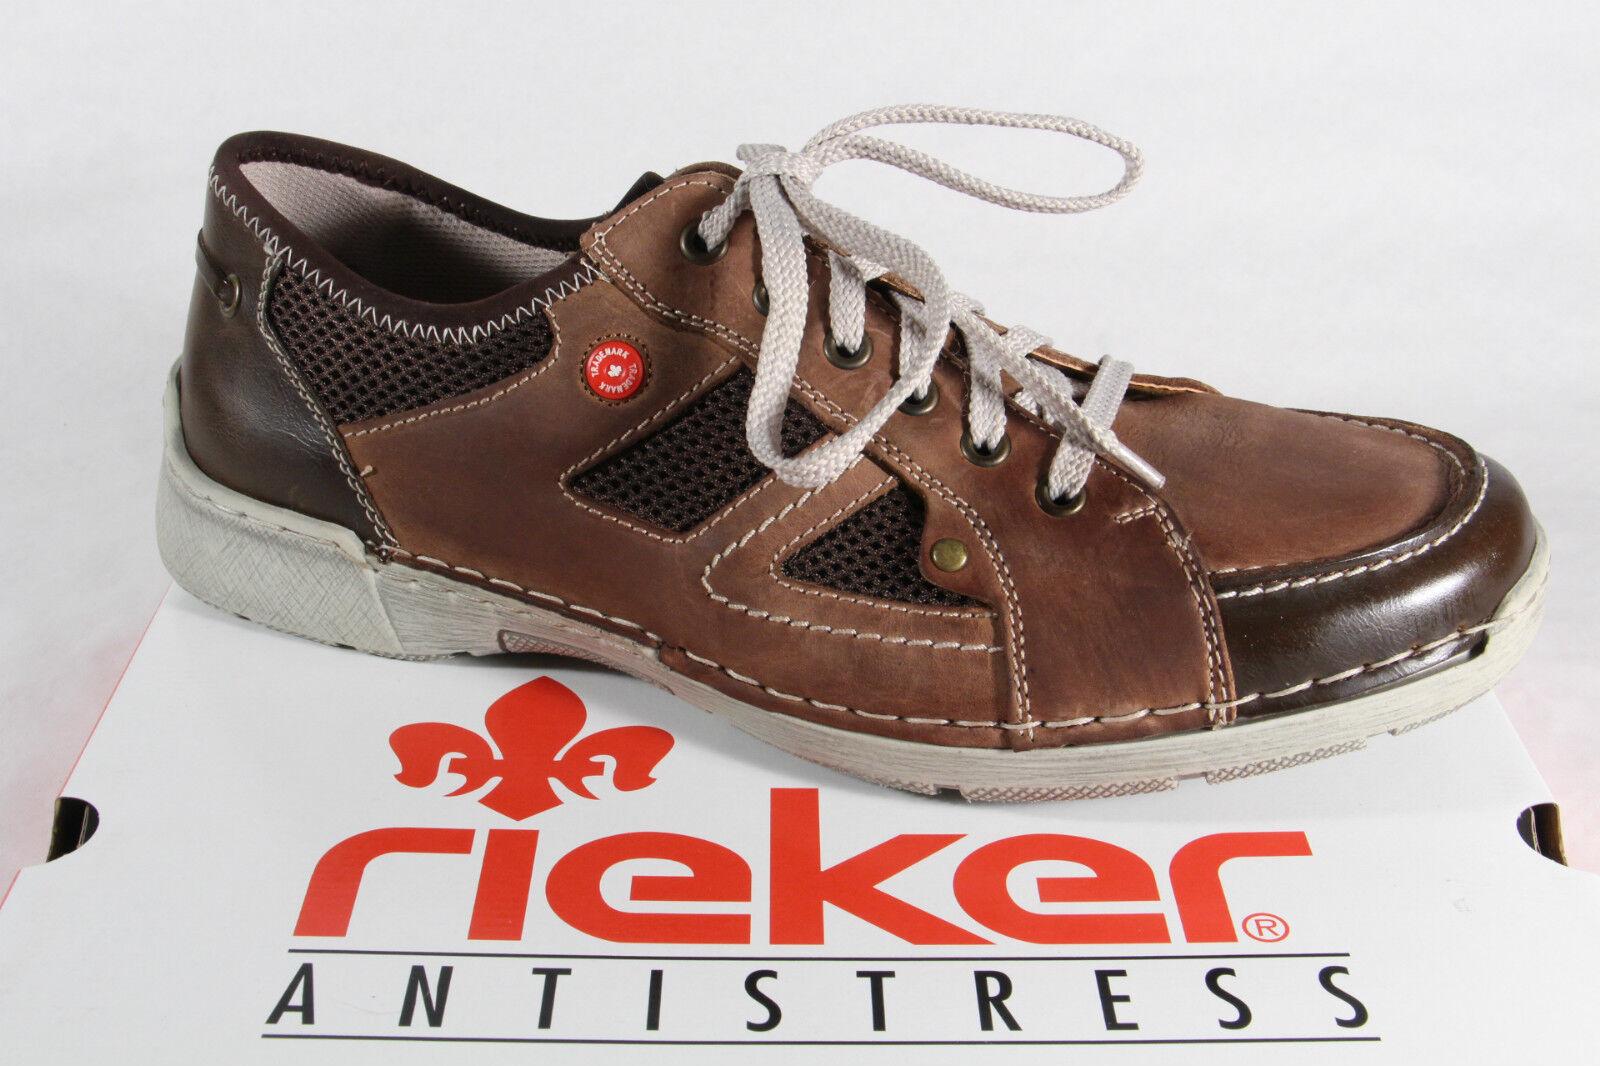 Rieker Men's Lace Loafer Sneaker Brown Insole New